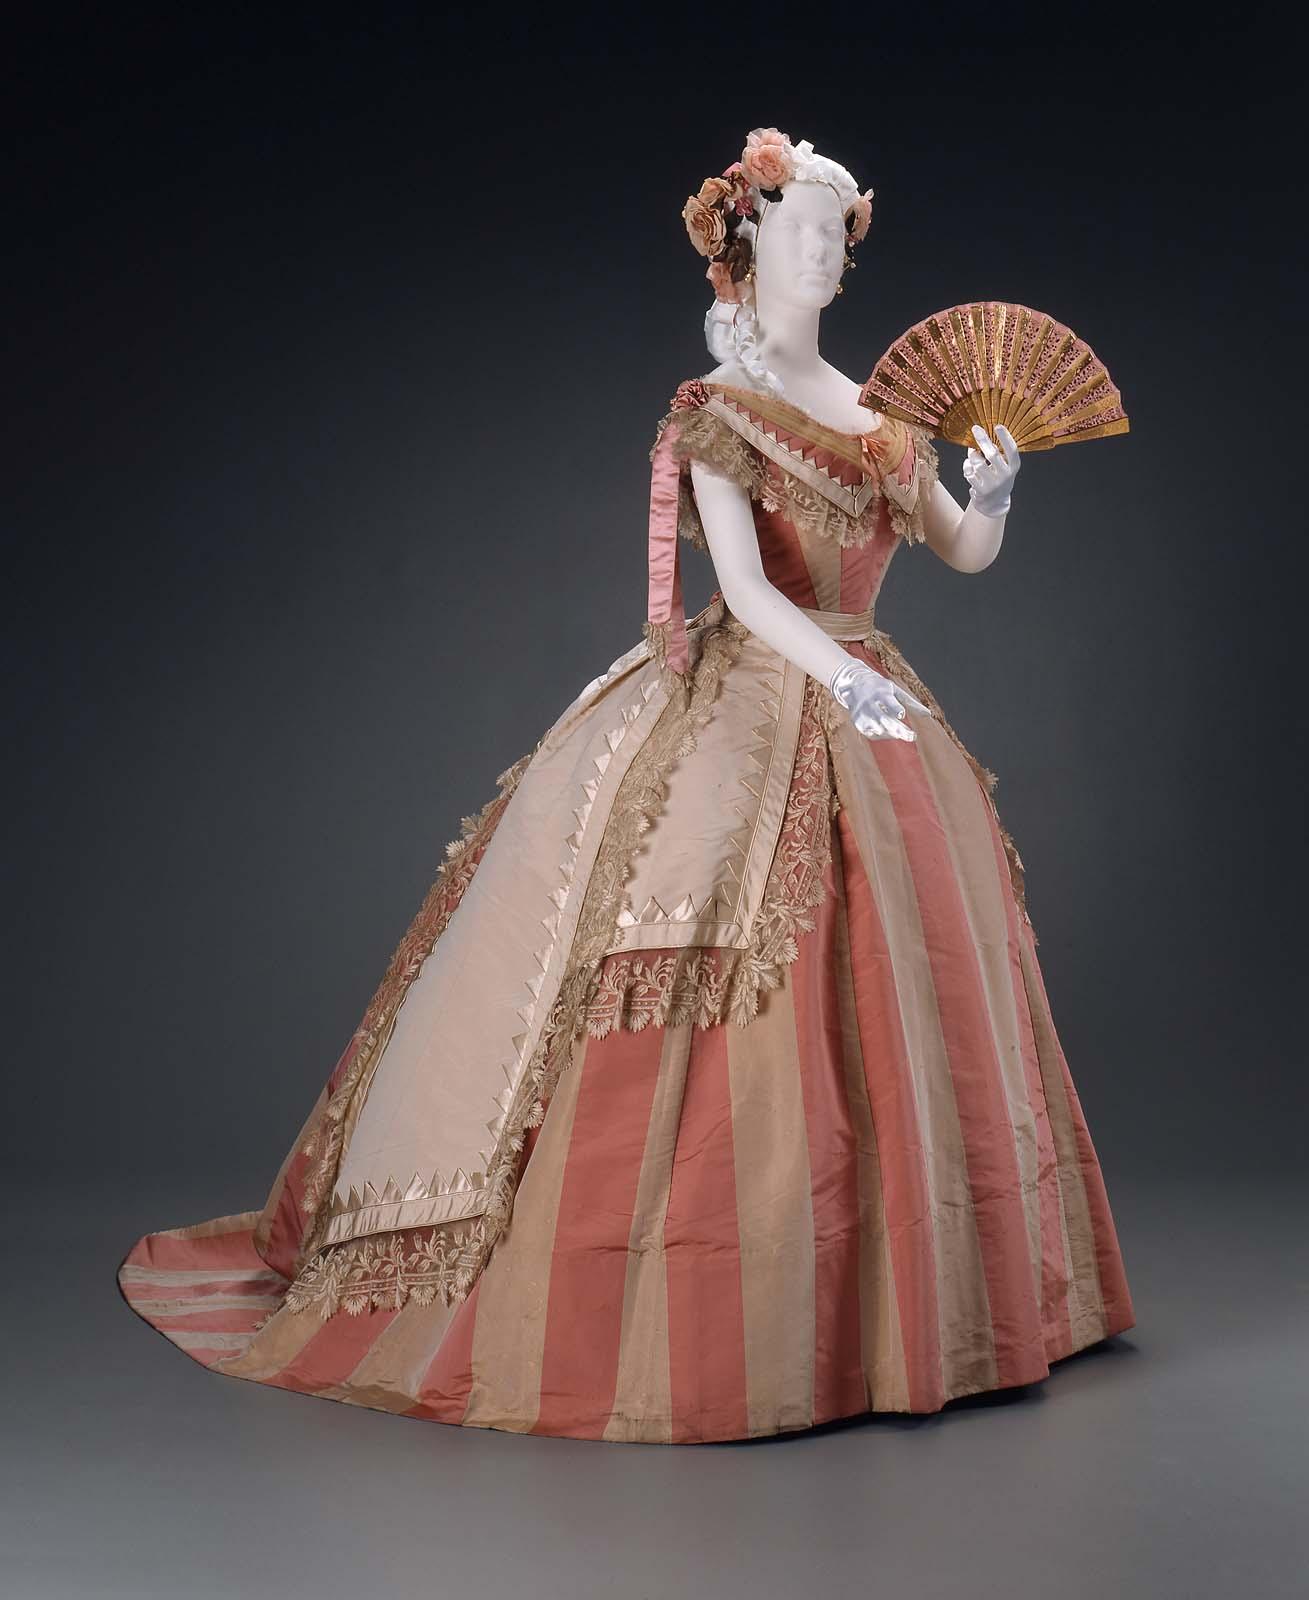 بالصور فساتين فرنسيه قديمه , ازياء وموديلات فستان رقيق 1094